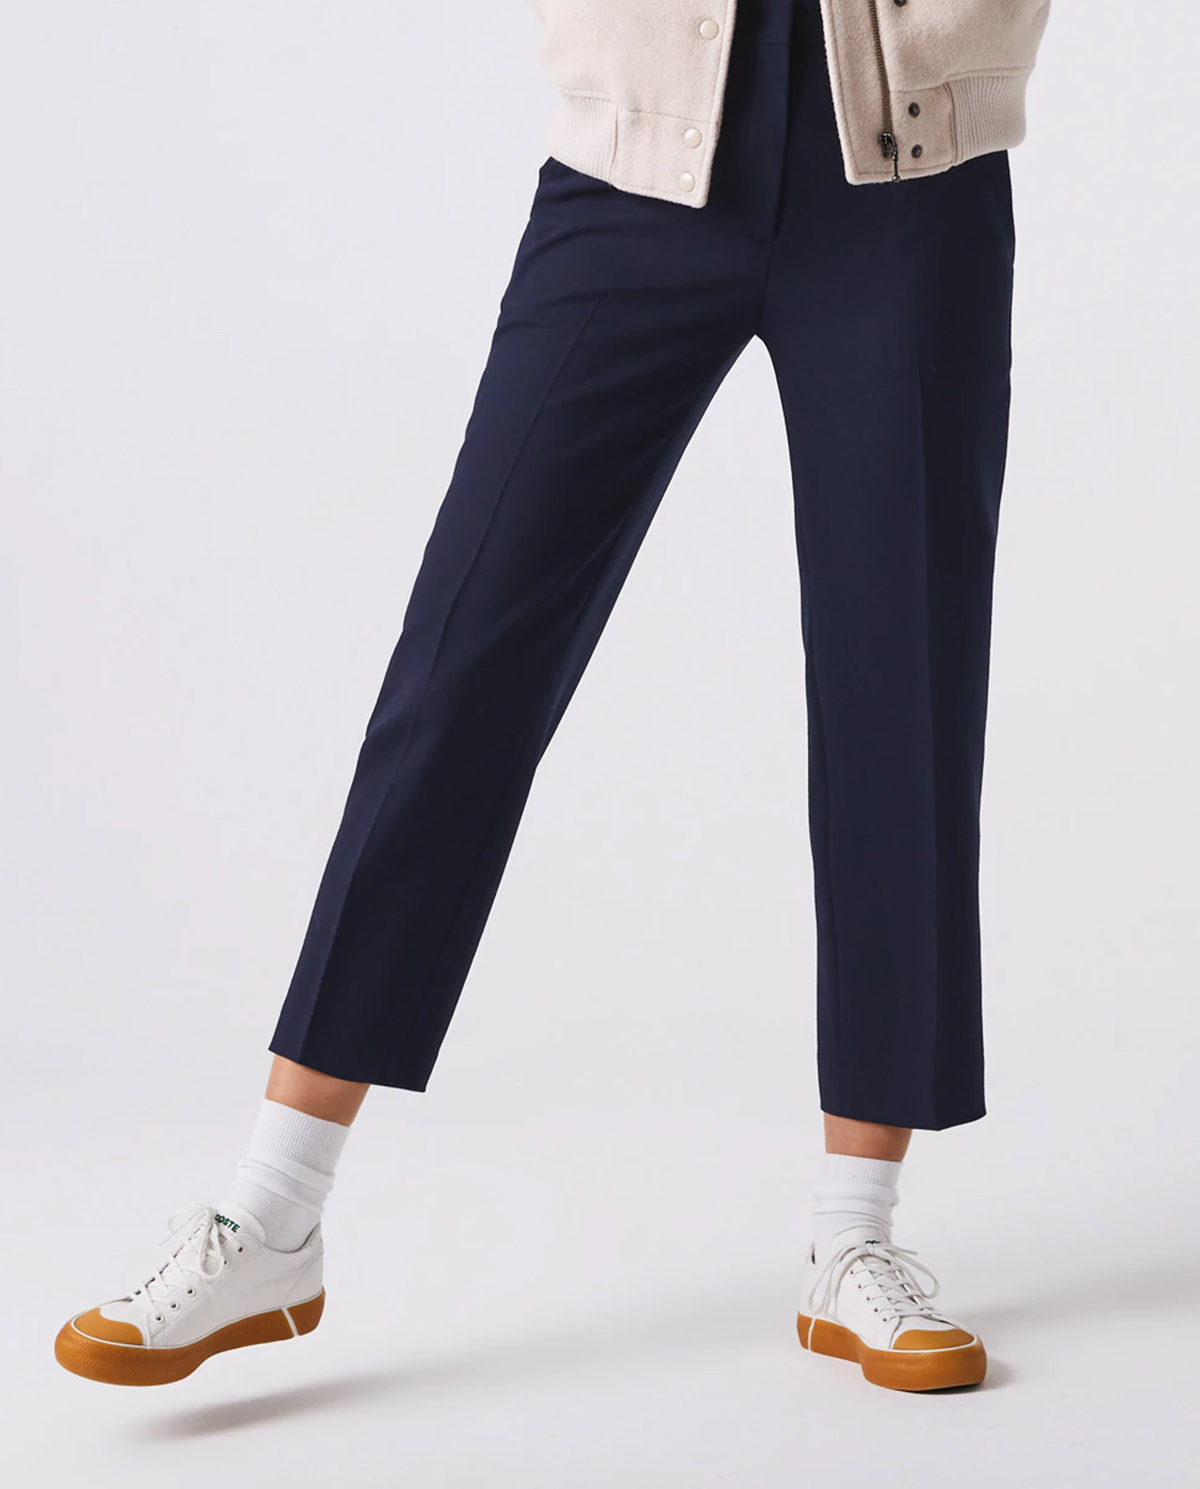 Spodnie z prostymi nogawkami i logo Lacoste HF2477 166